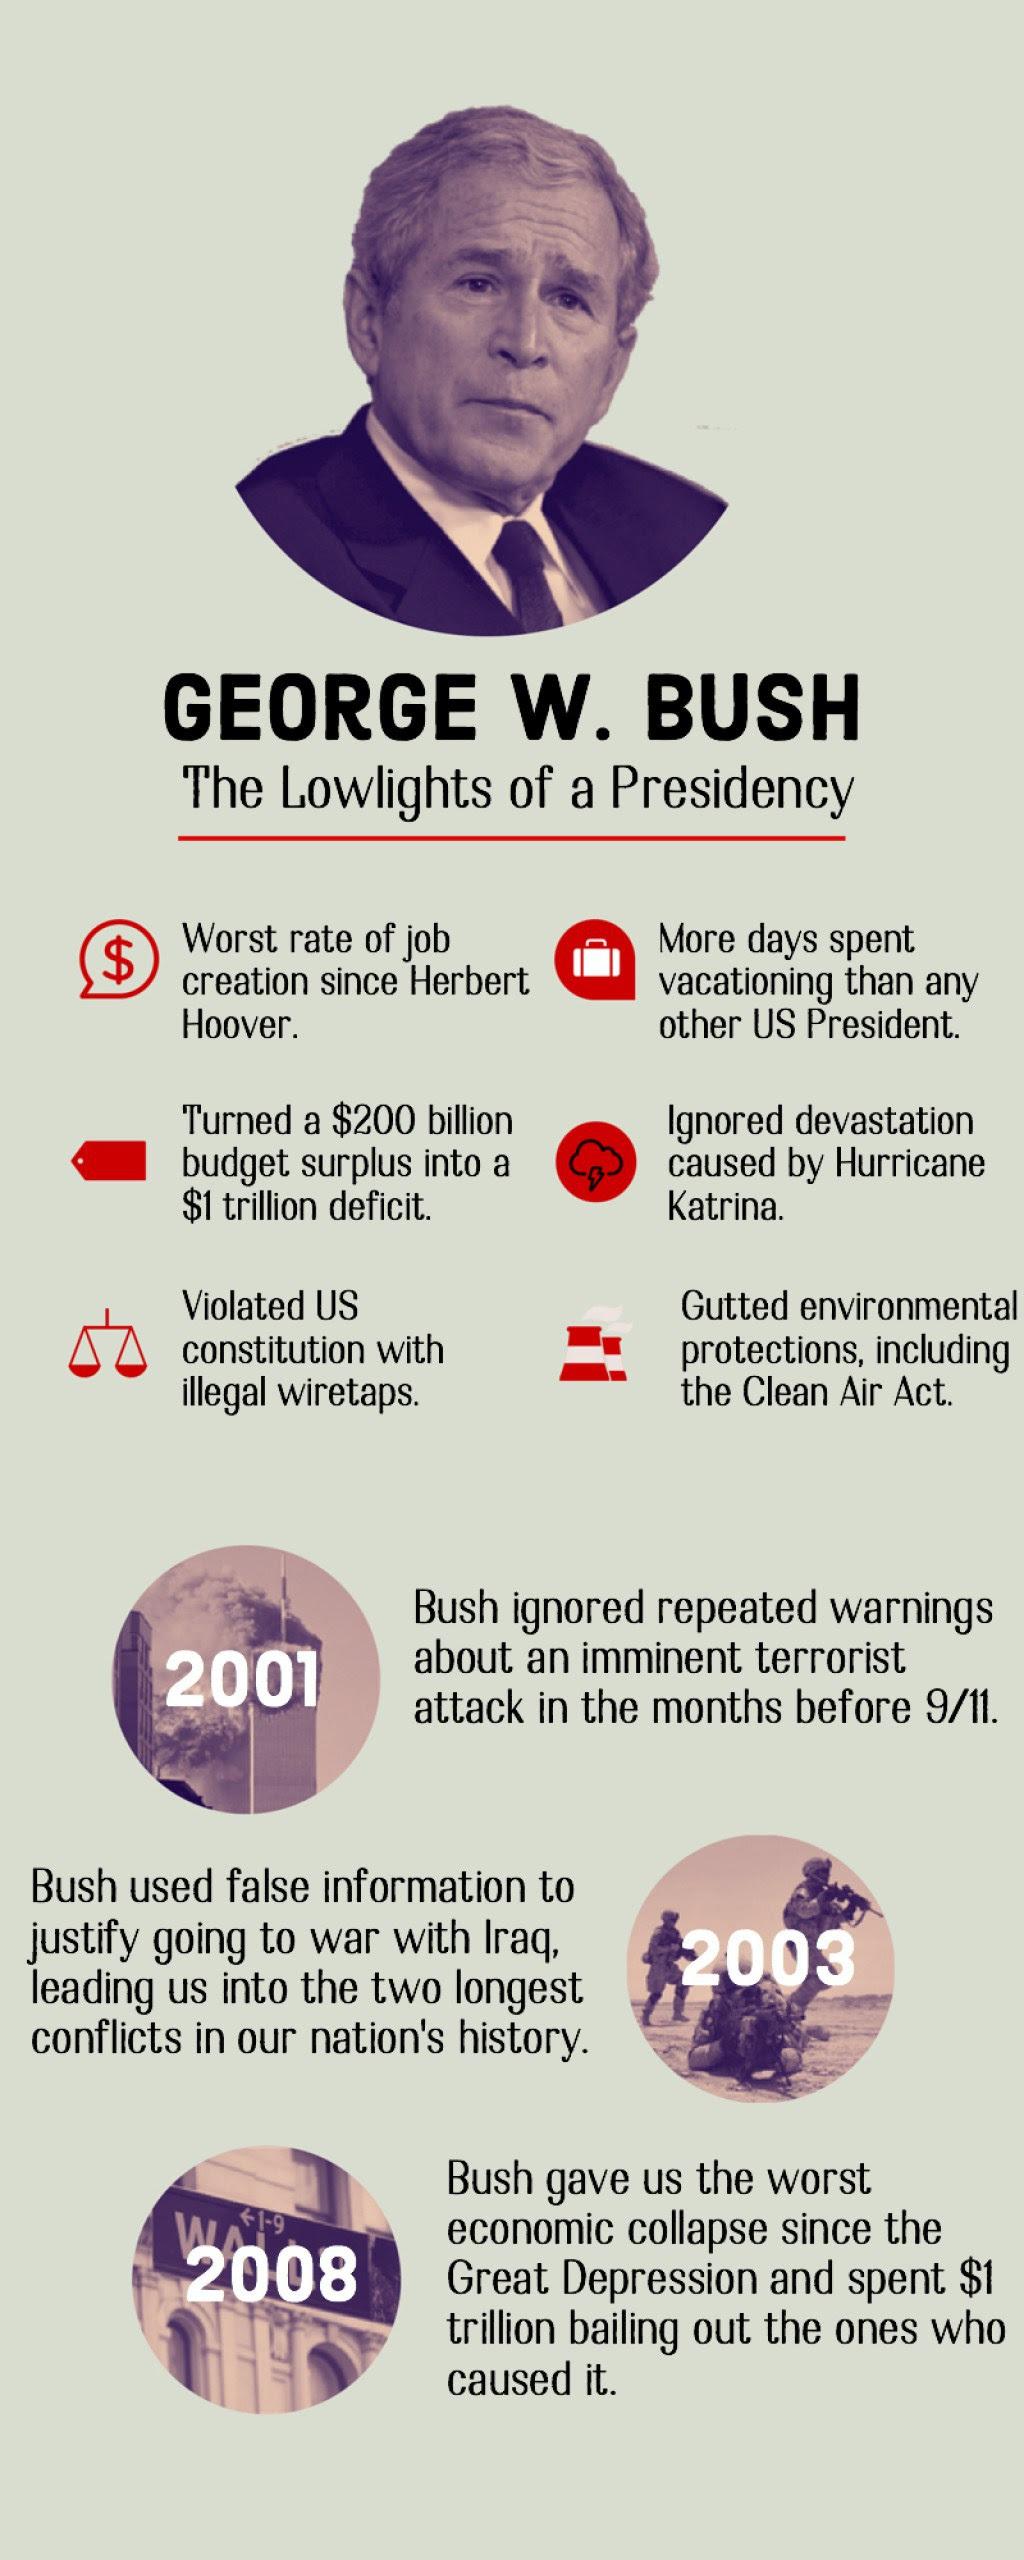 George W. Bush, Lowlights of a Presidency.